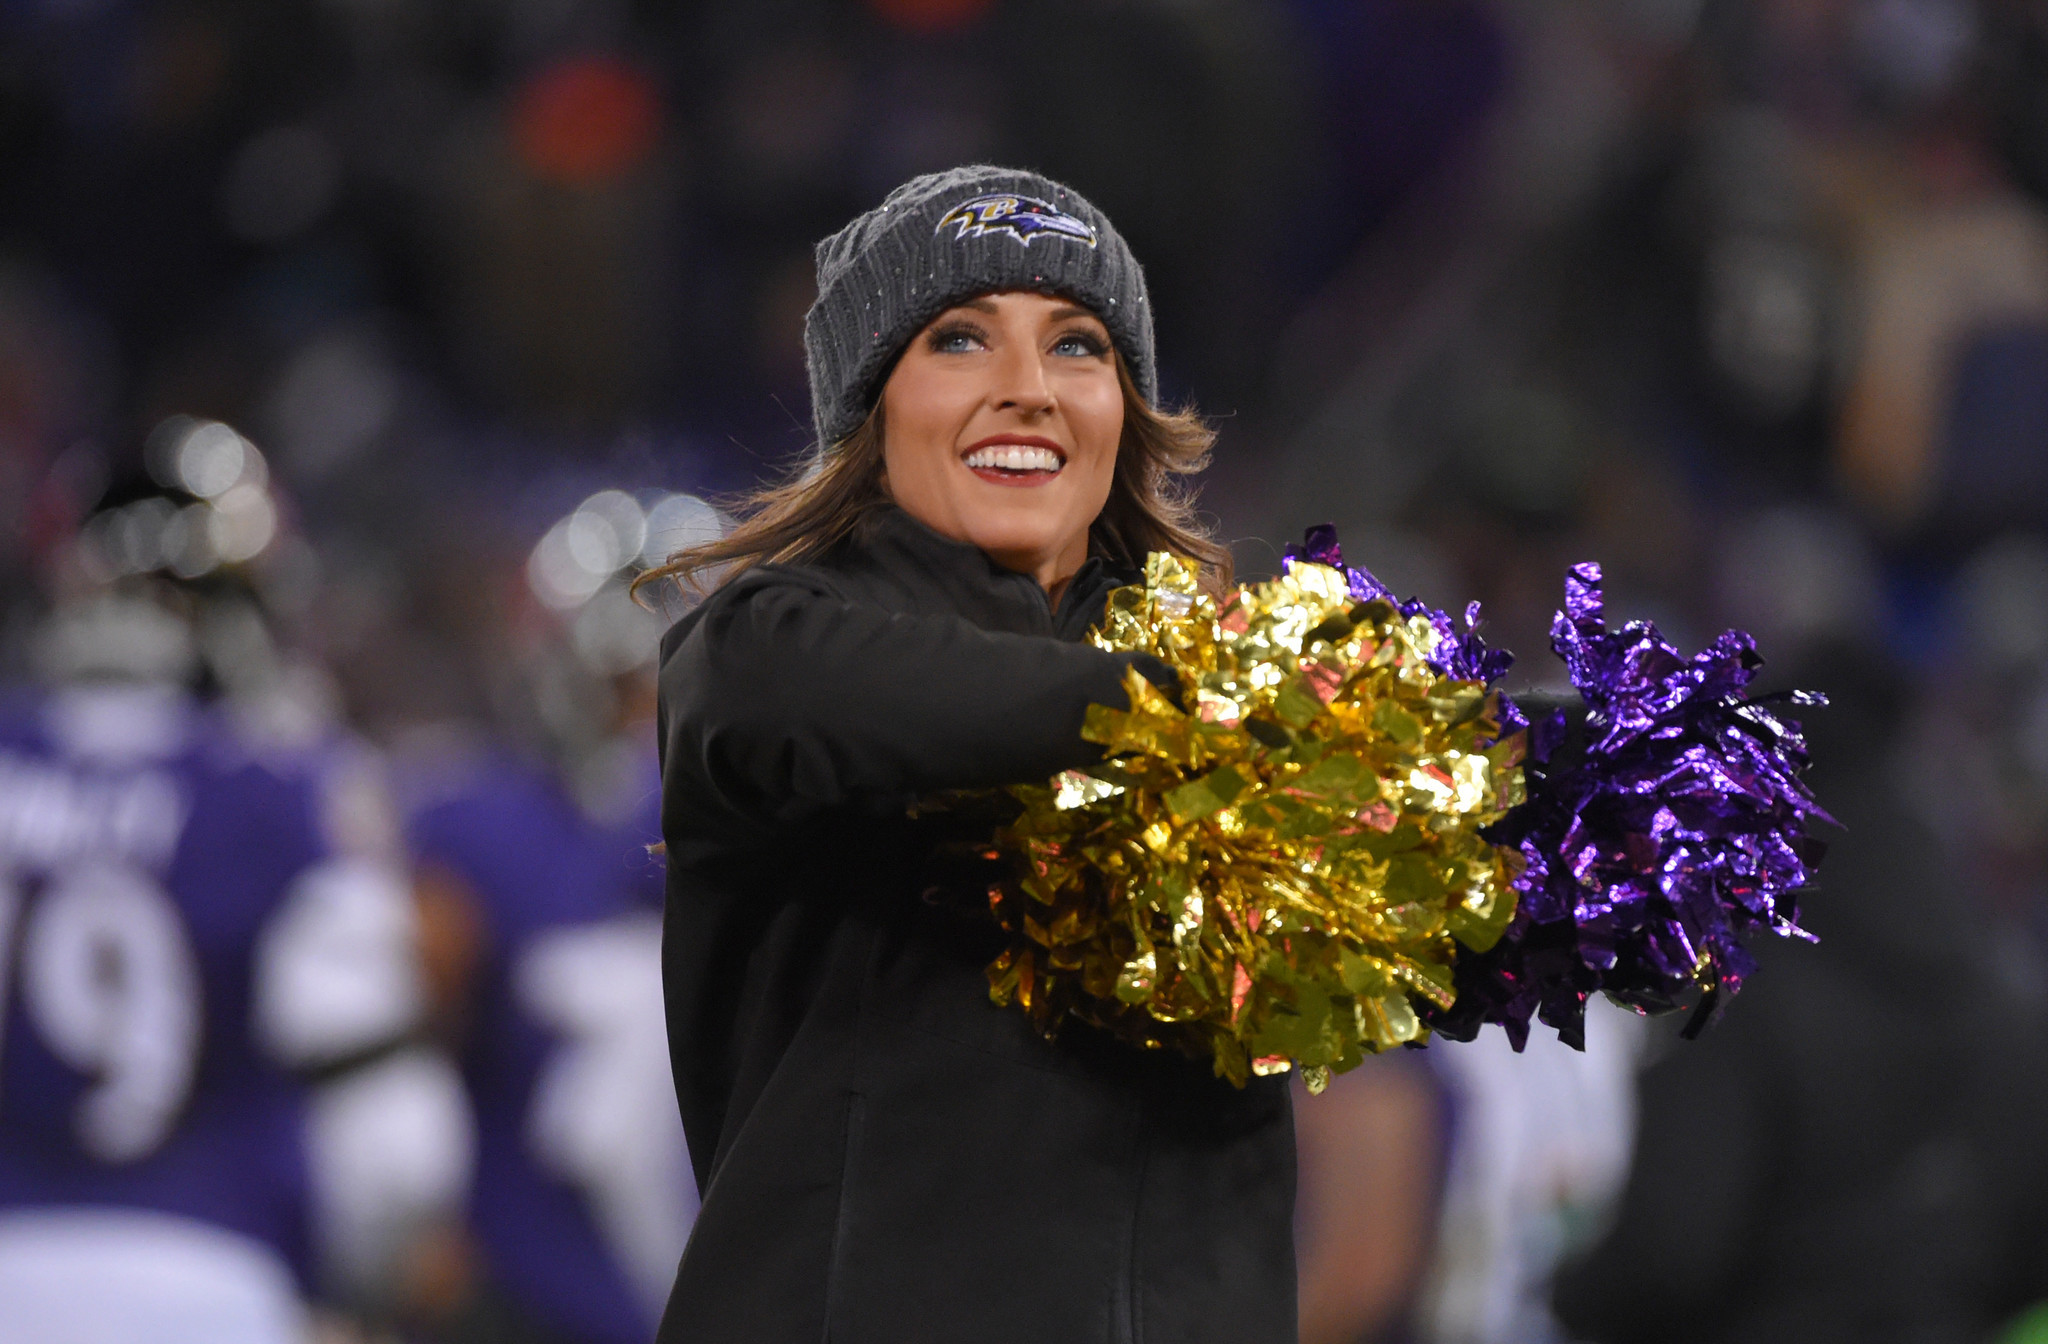 Ravens cheerleaders 2017 - Baltimore Sun